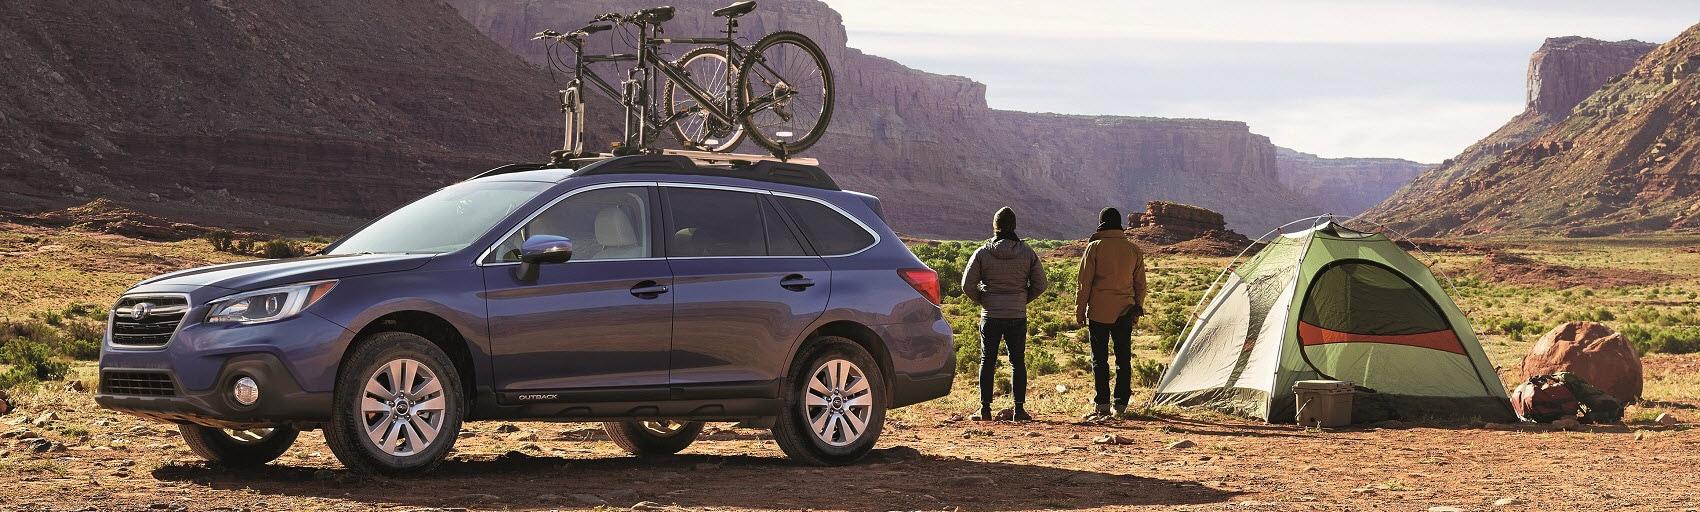 2020 Subaru Outback vs Chevy Equinox | Fred Beans Subaru ...